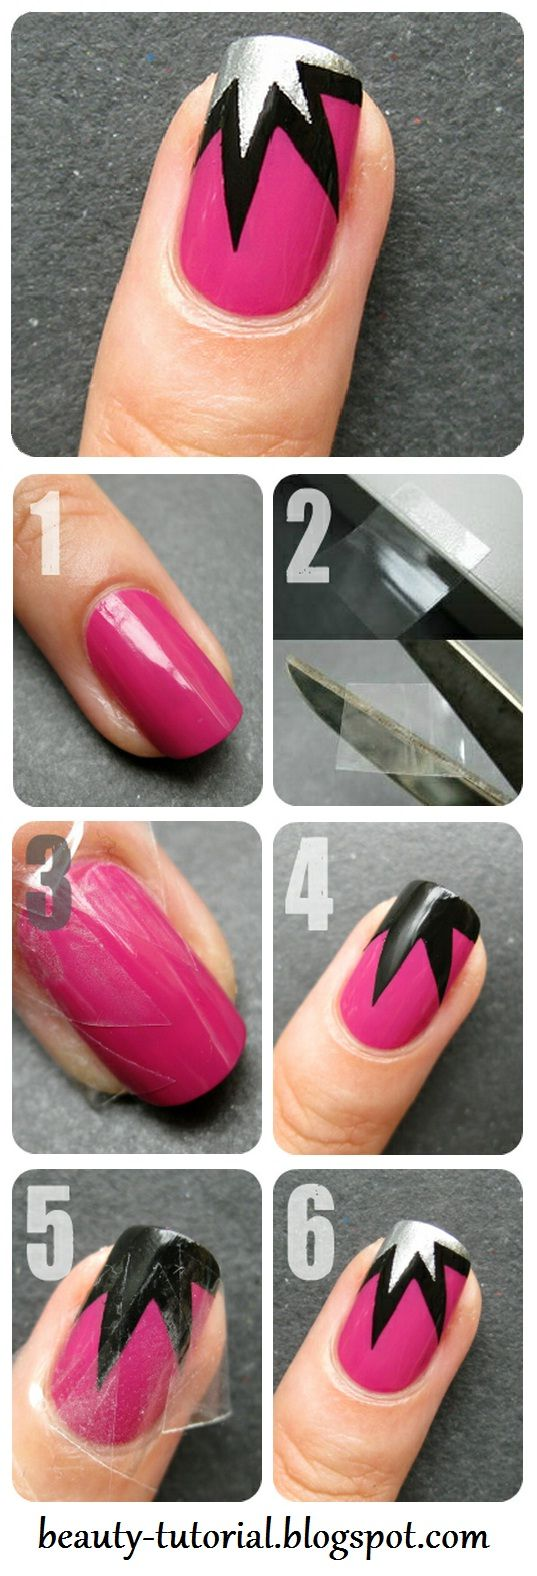 Explosion nail art design tape manicure tutorial nadyana magazine